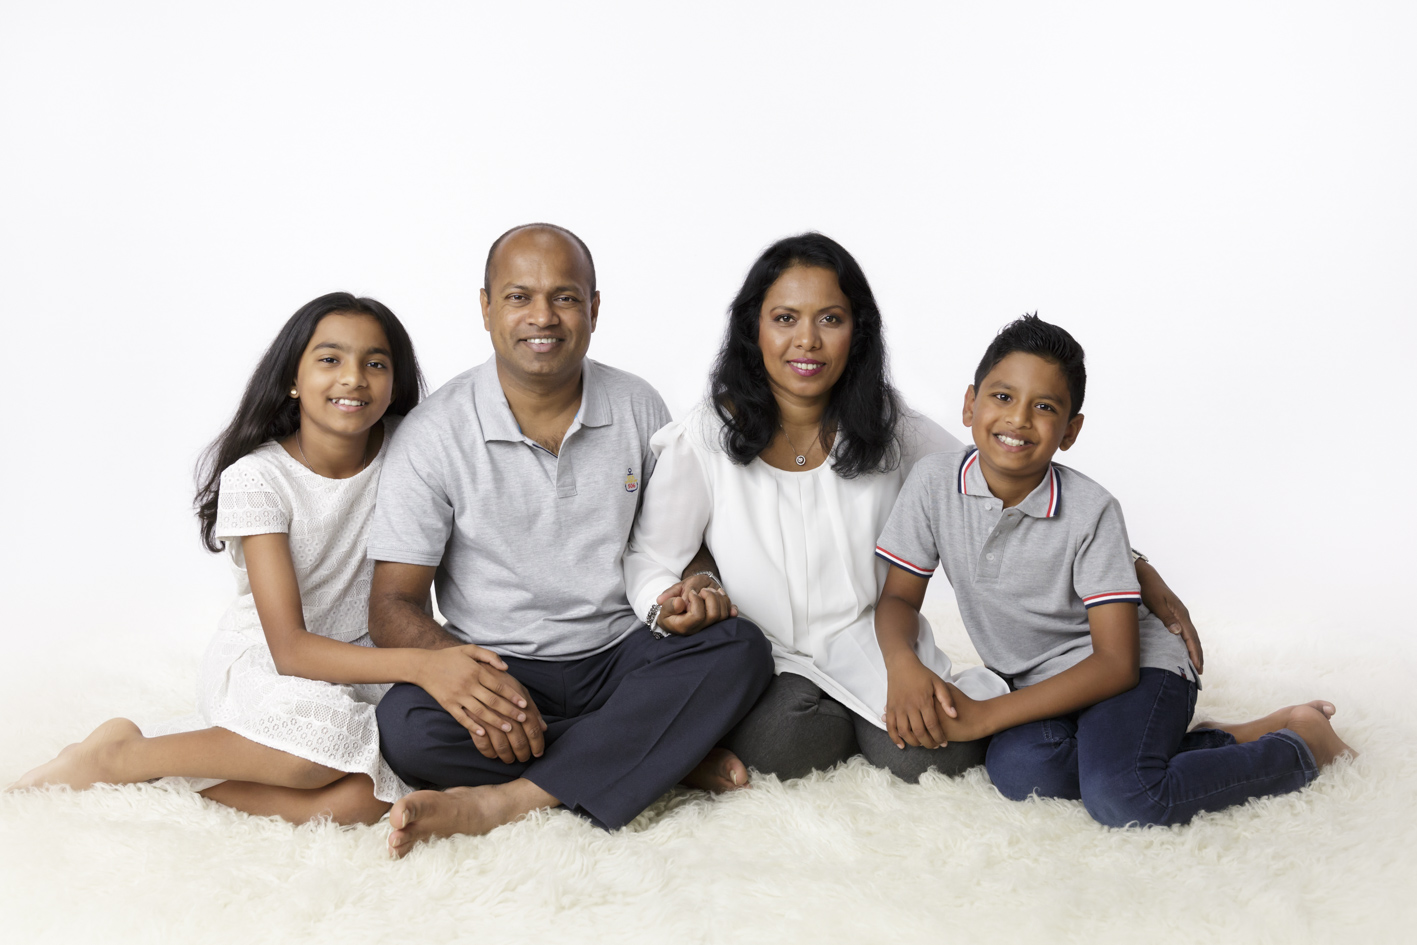 stunning family photo